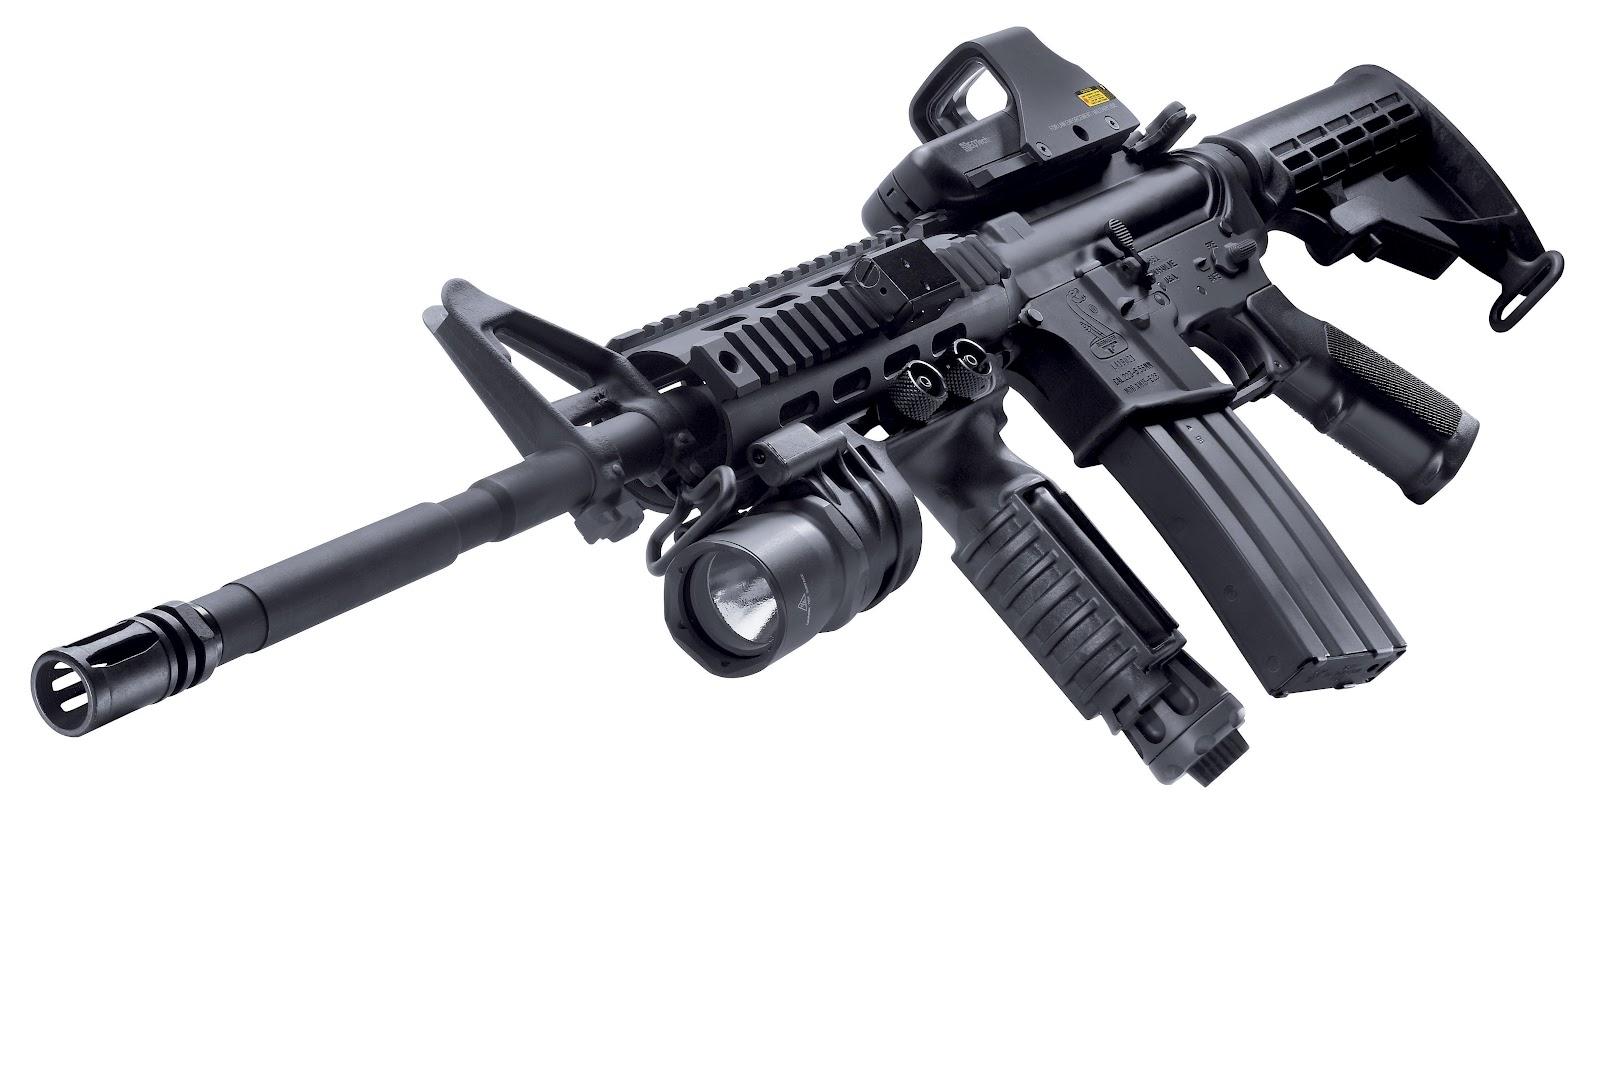 http://3.bp.blogspot.com/-JY62JhOeuas/T8lImF-ReLI/AAAAAAAAB5w/n_u0GAT64m0/s1600/M4A1_Assault_Rifle_HD_Military_Wallpaper.jpg